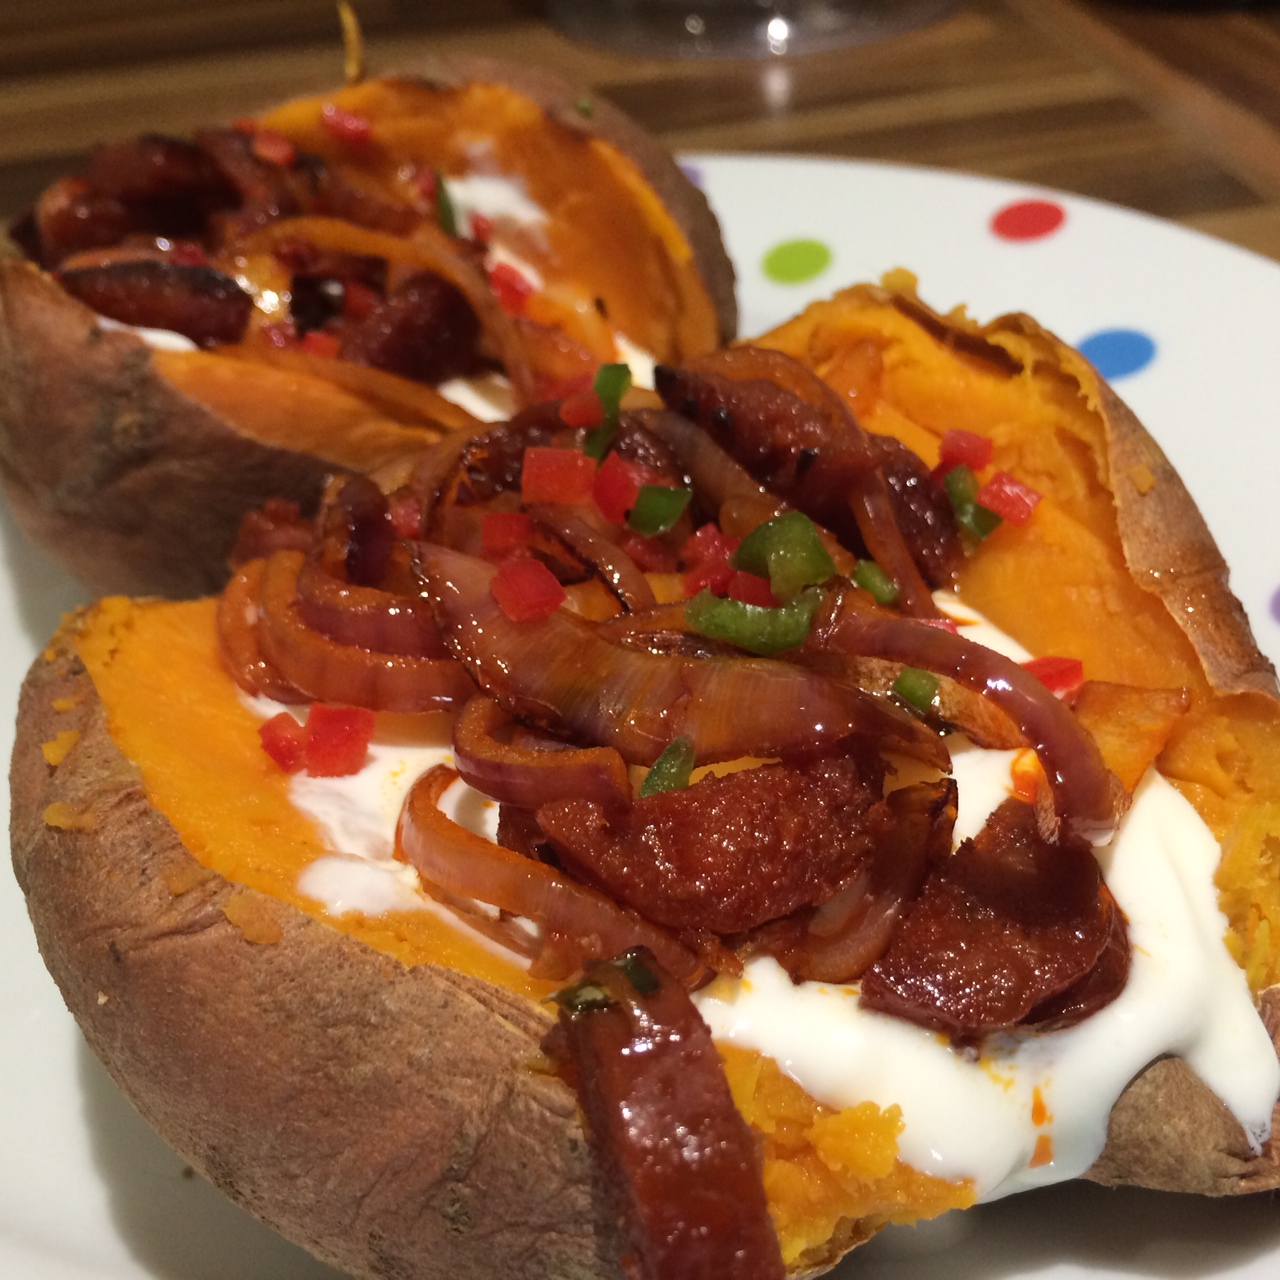 Spicy baked sweet potato